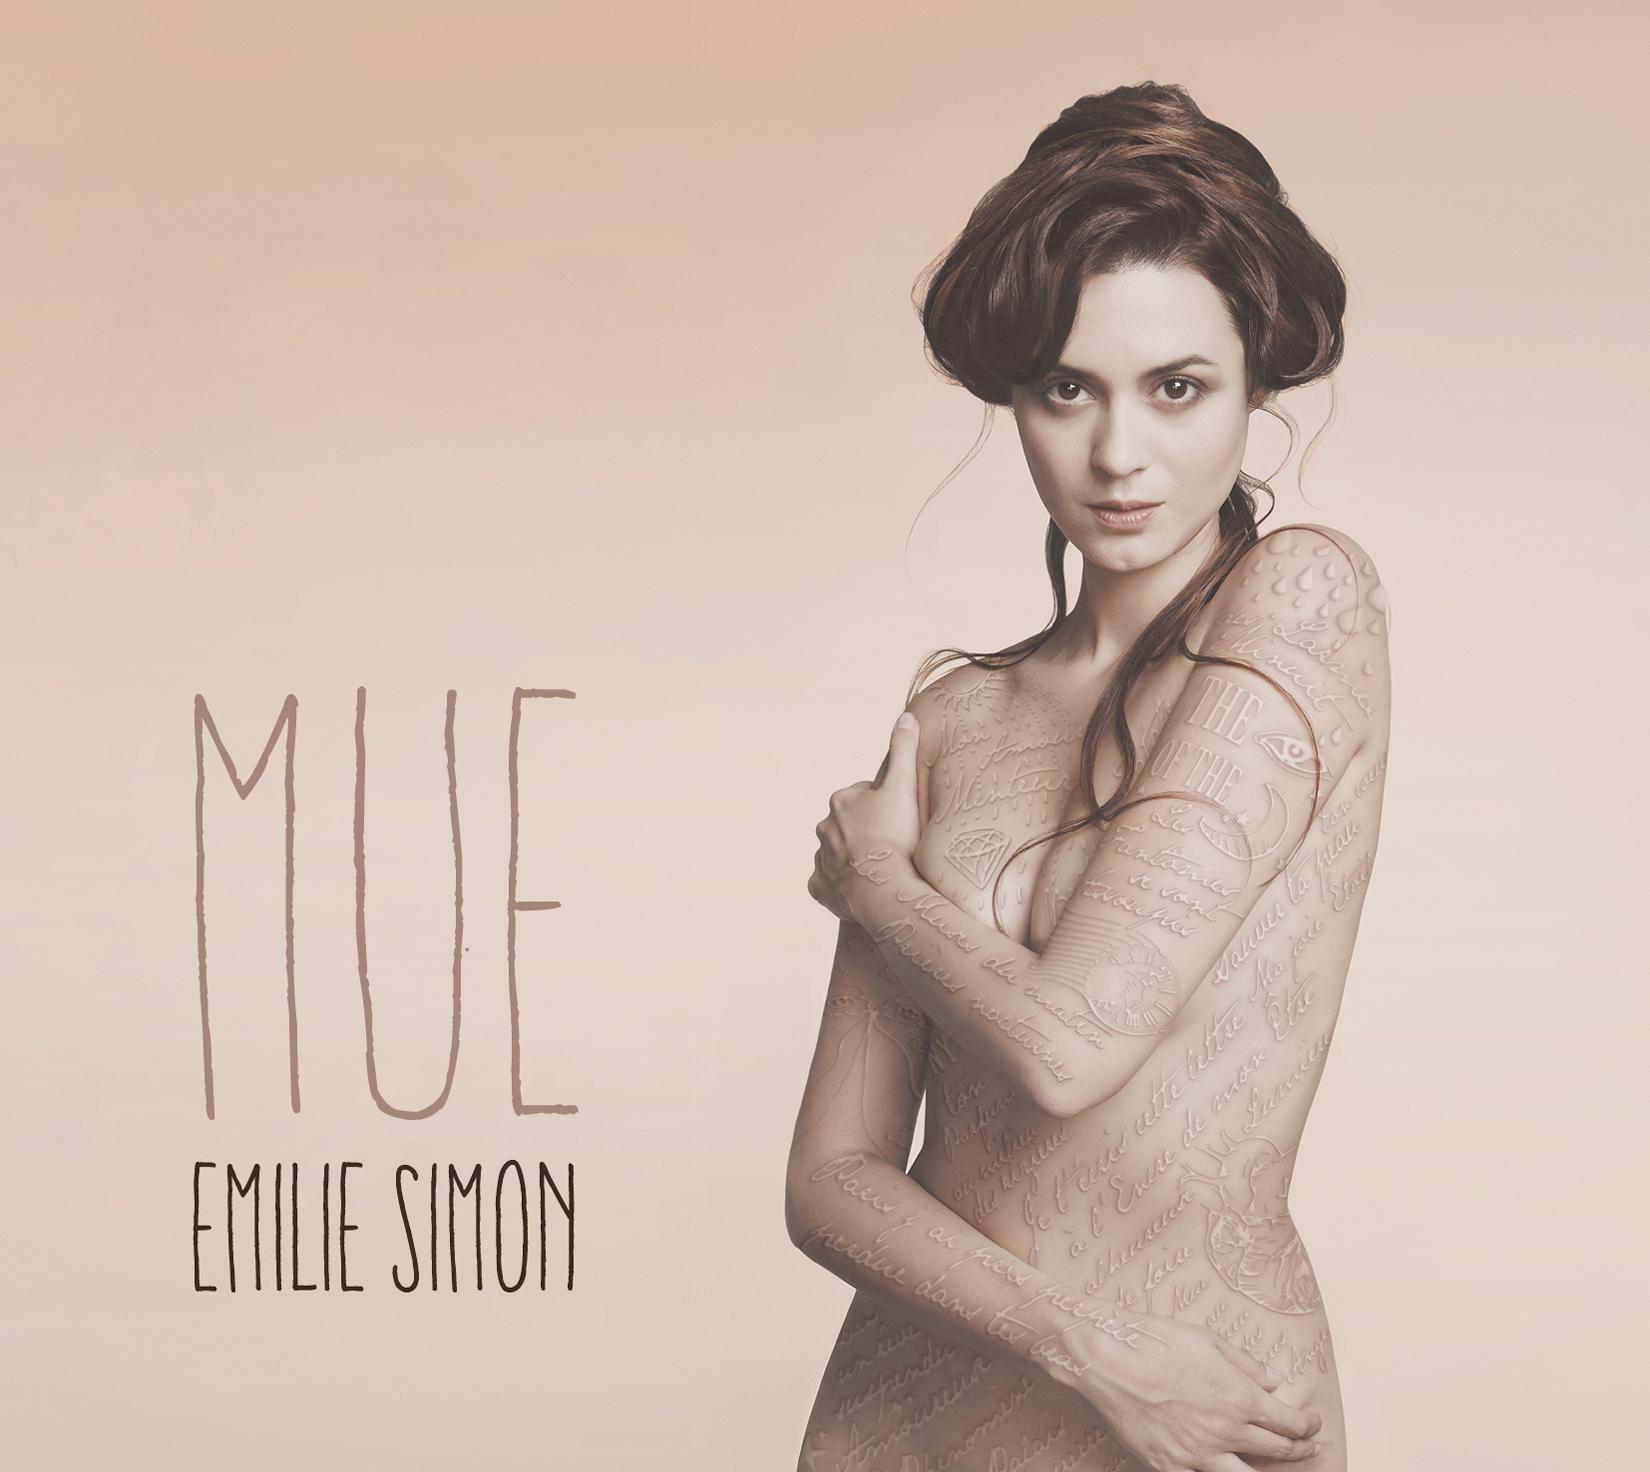 emilie_simon_mue1